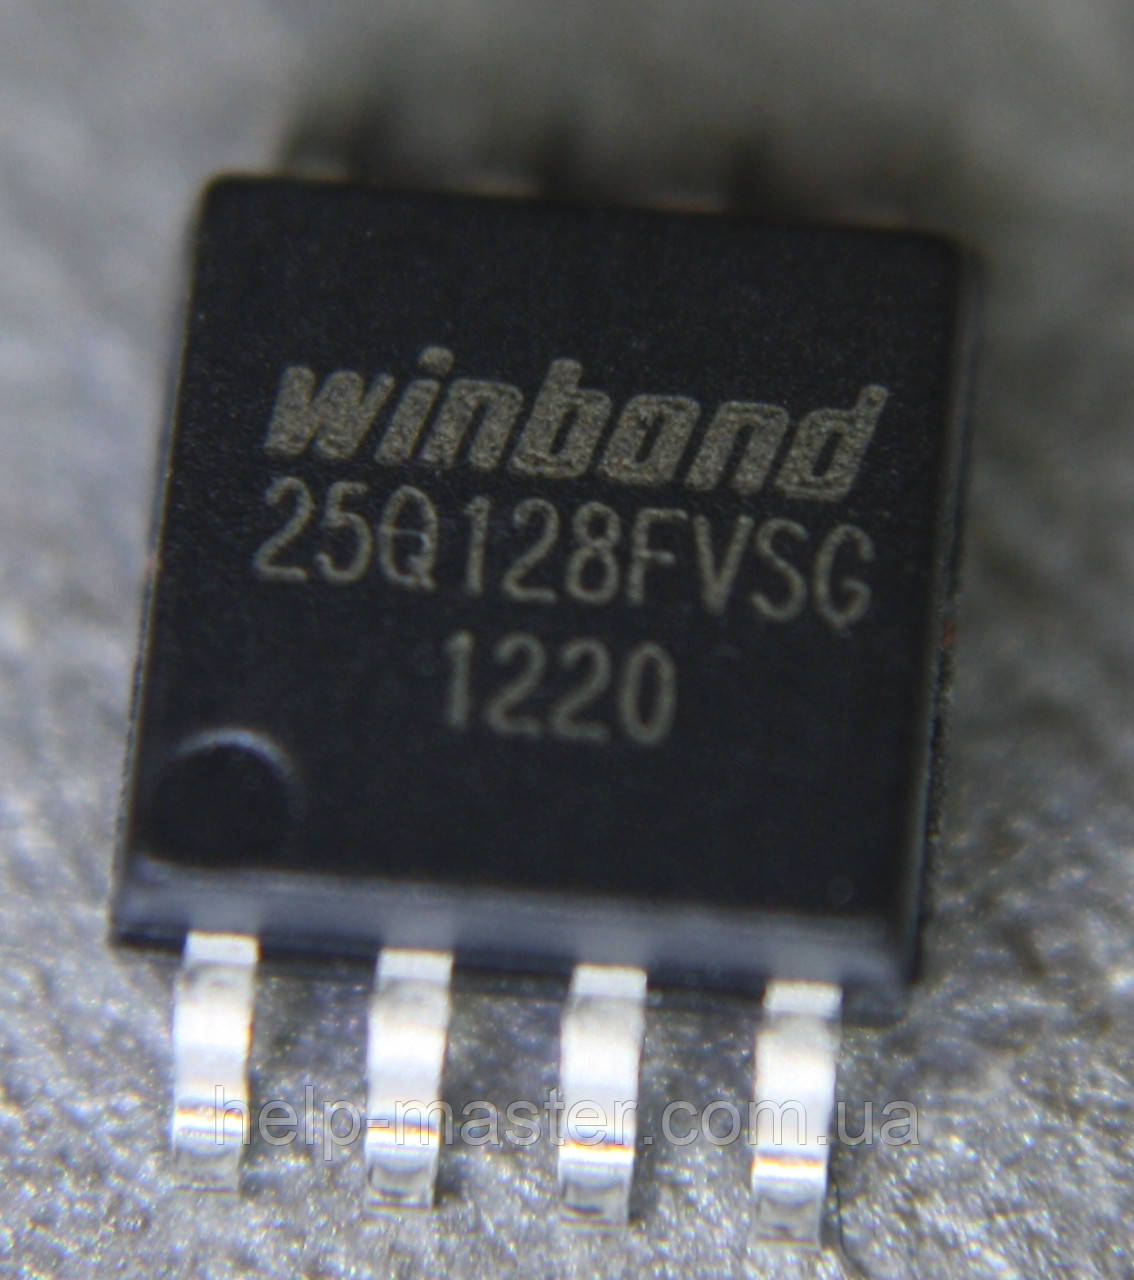 W25Q128FVSG;(SOP-8)